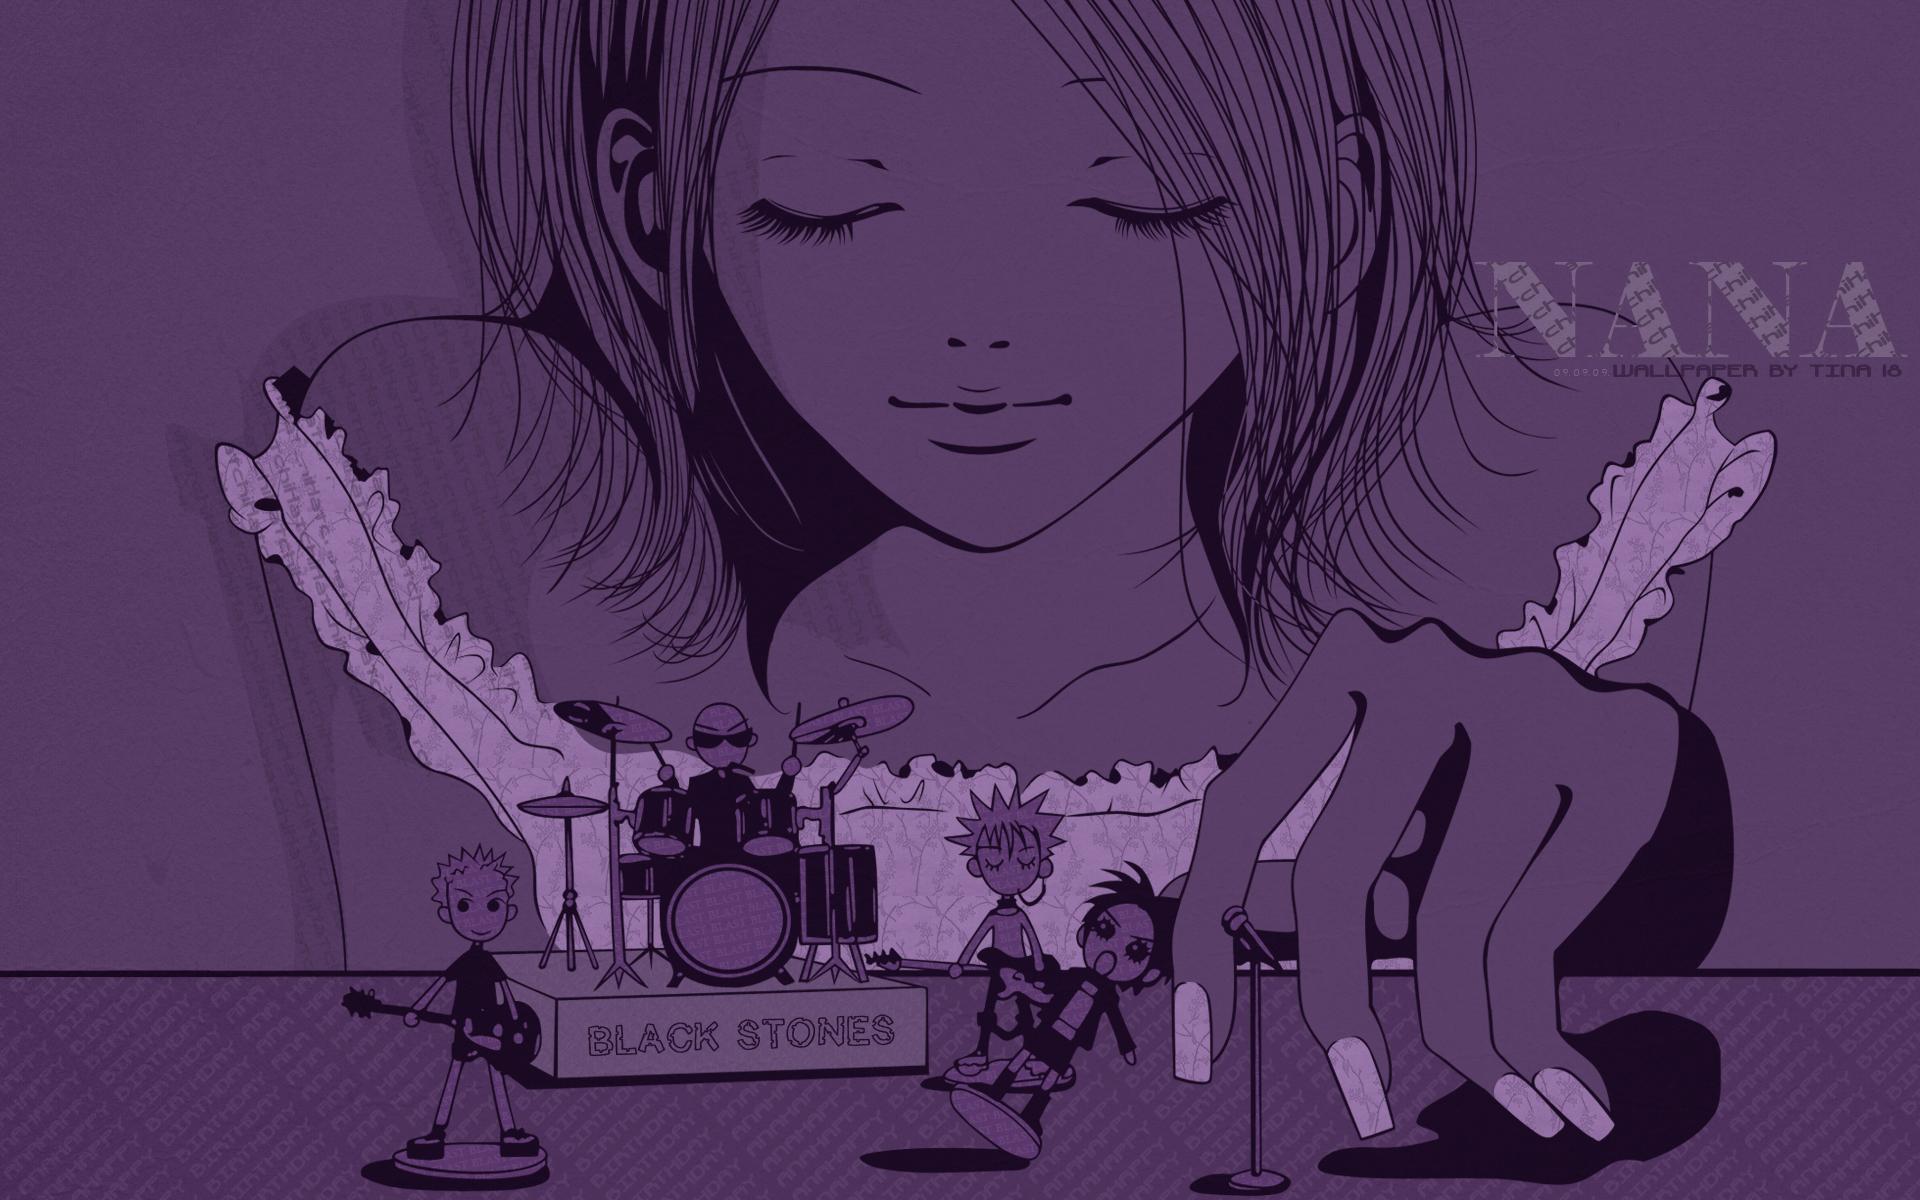 Nana Anime Wallpaper Nana Full Hd Fond D 233 Cran And Arri 232 Re Plan 1920x1200